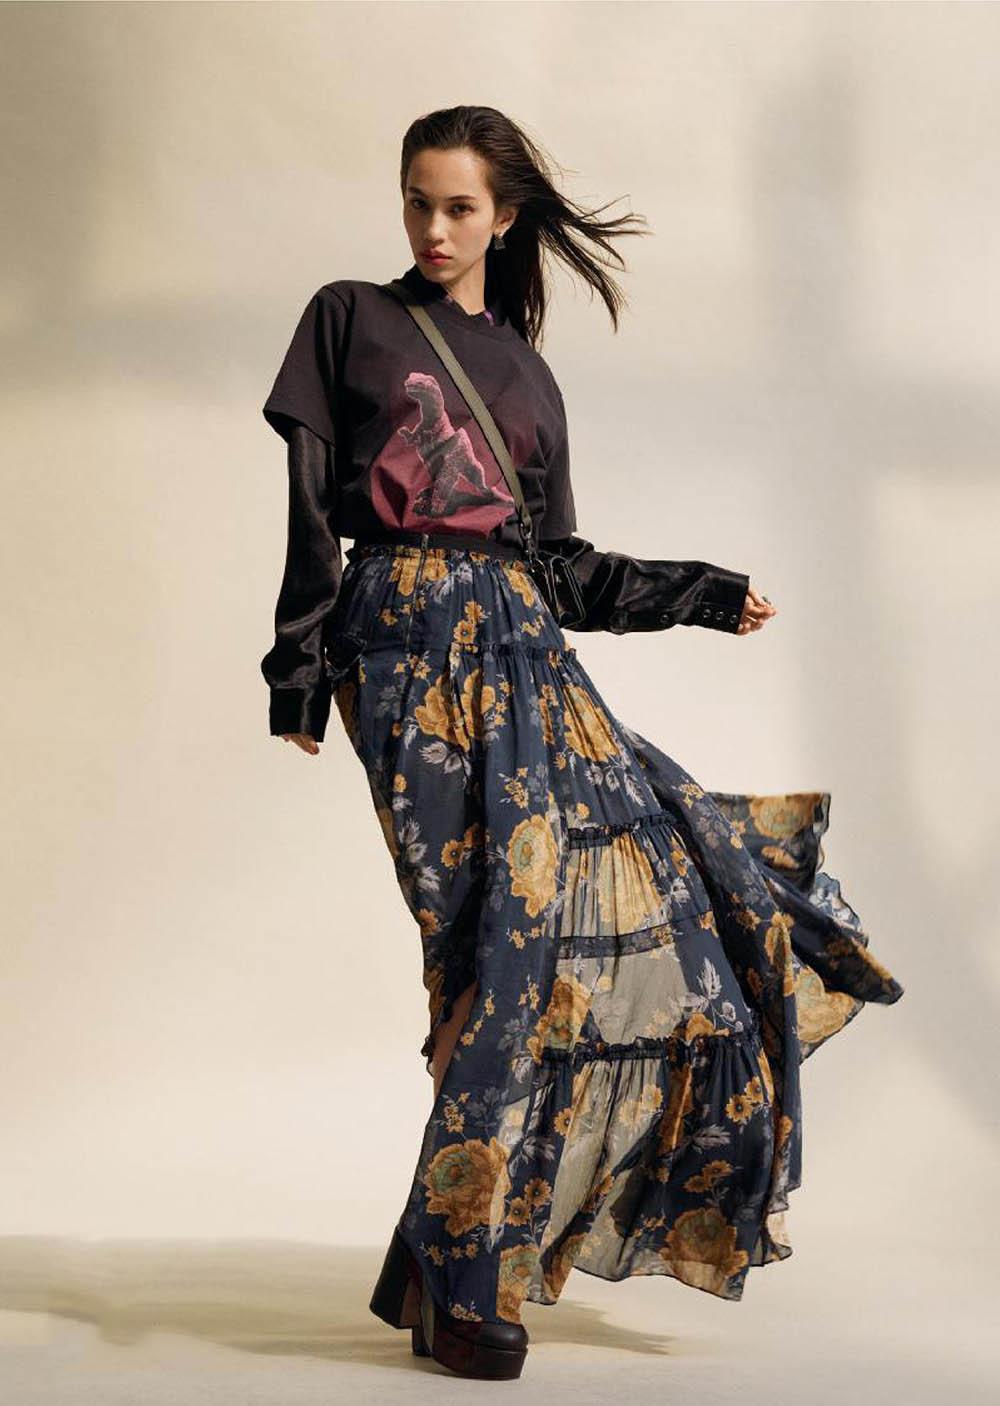 Kiko Mizuhara covers L'Officiel Paris August 2019 by Jens Langkjaer